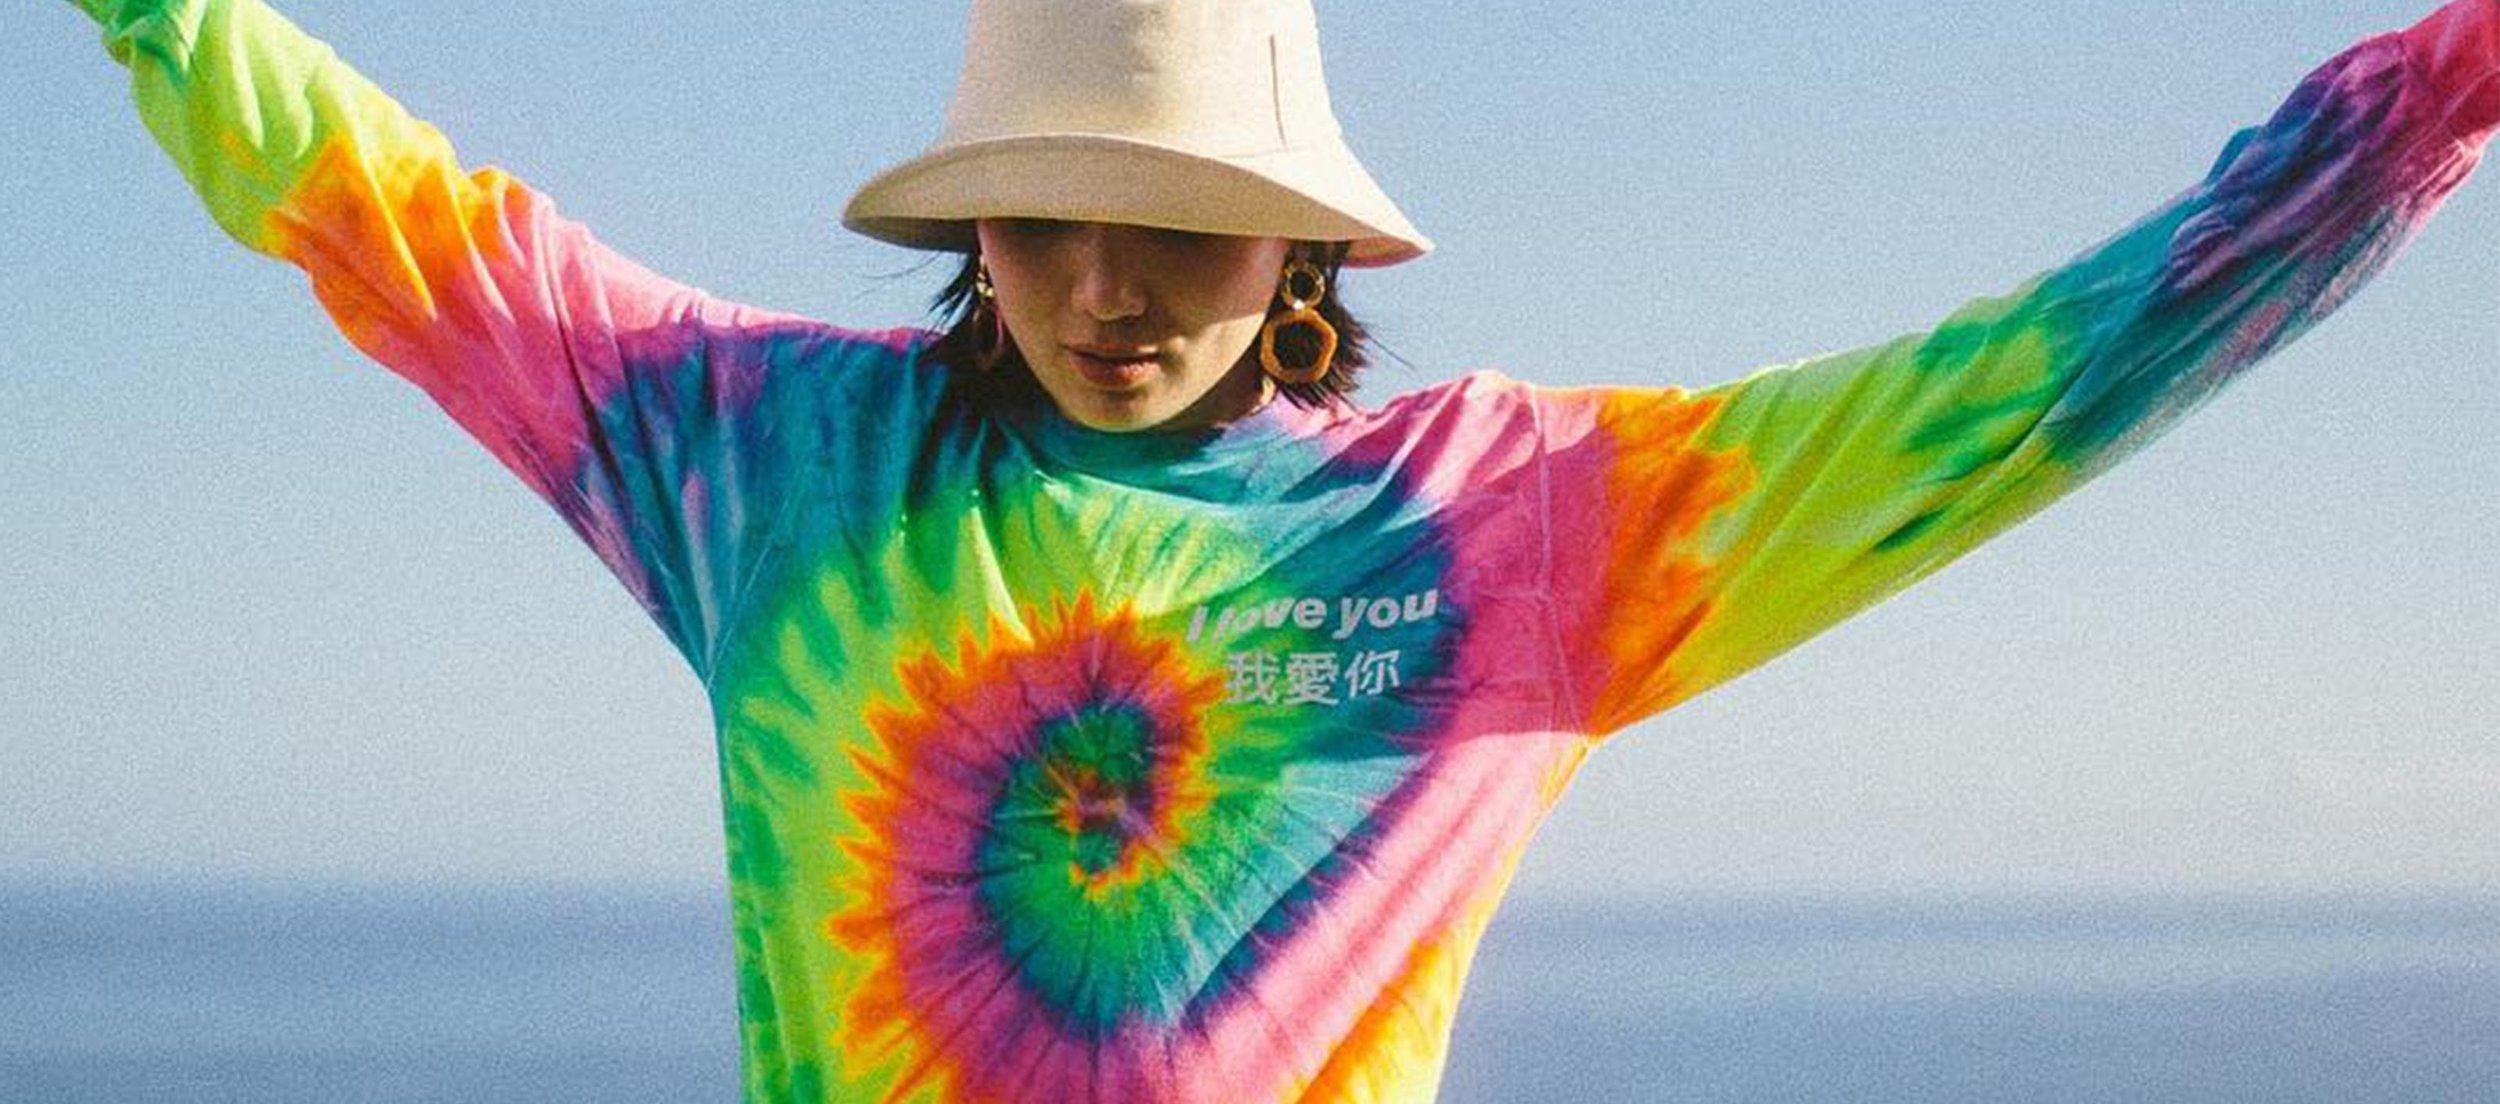 jaw-shop-streetwear-hype-brand_hero.jpg